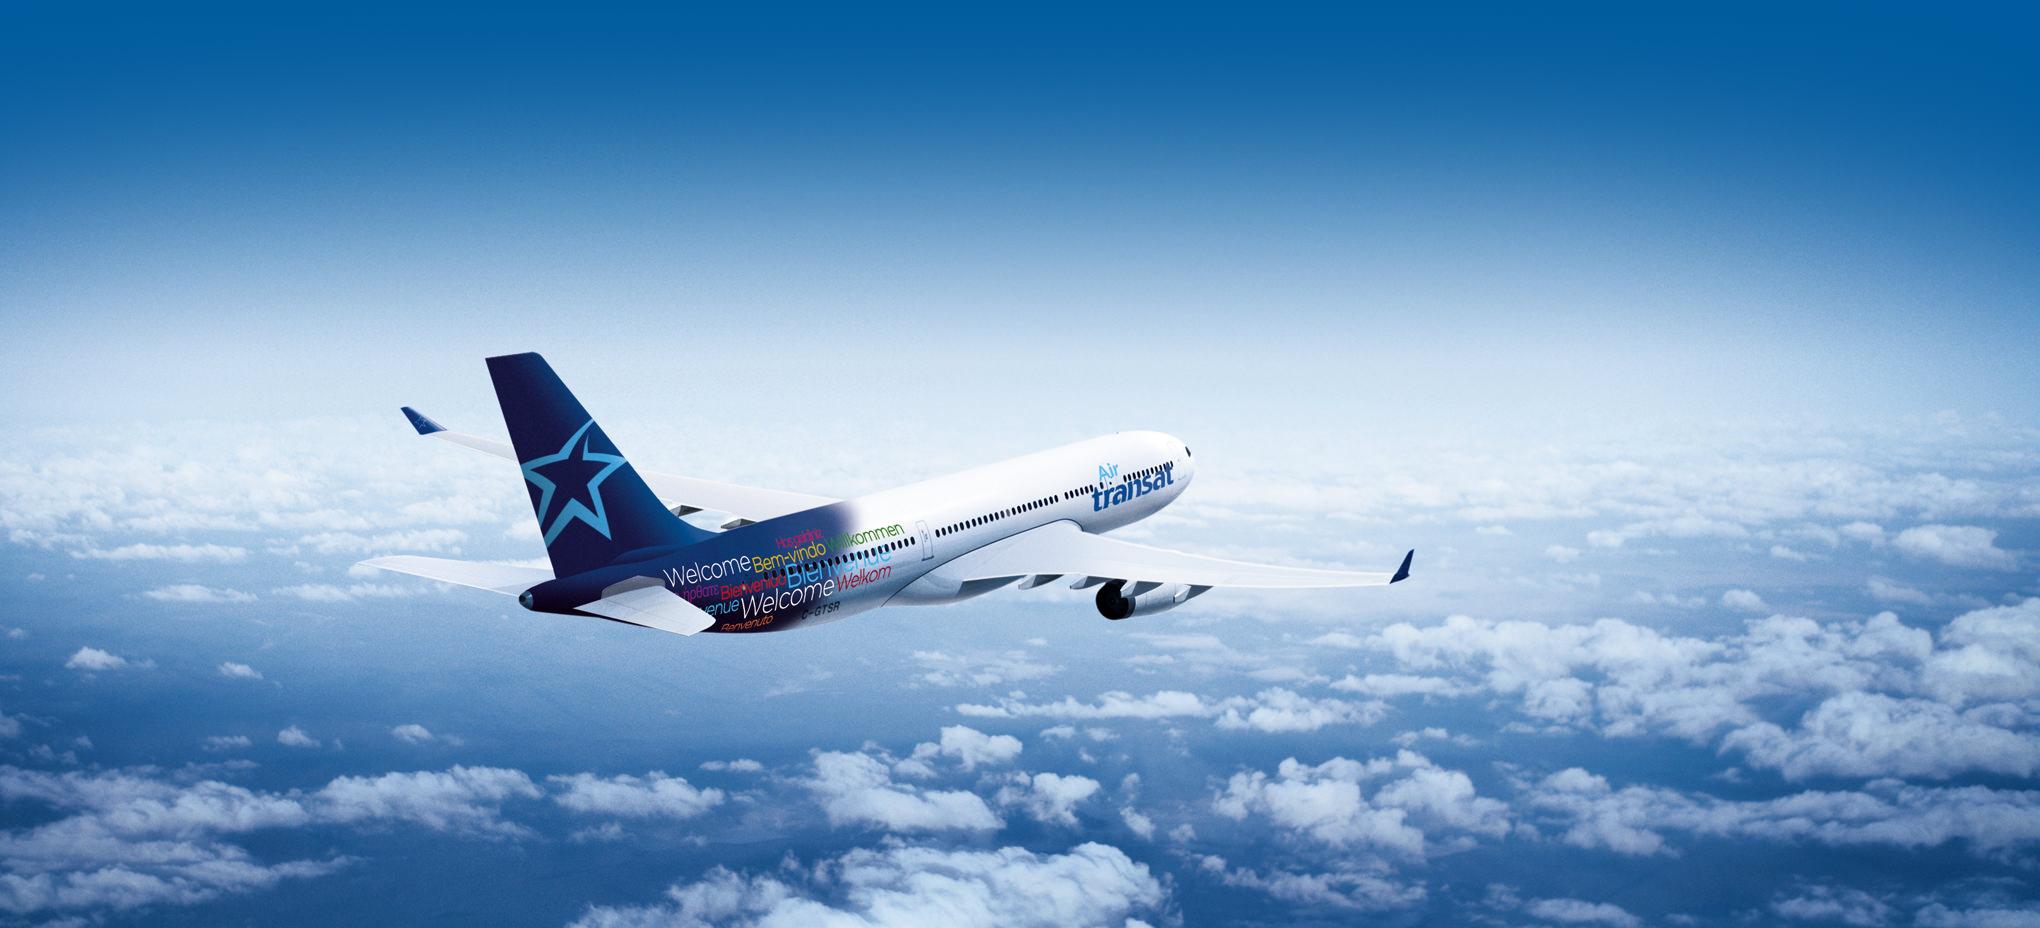 Air transat – vols pas cher vers le Canada – Dealabs